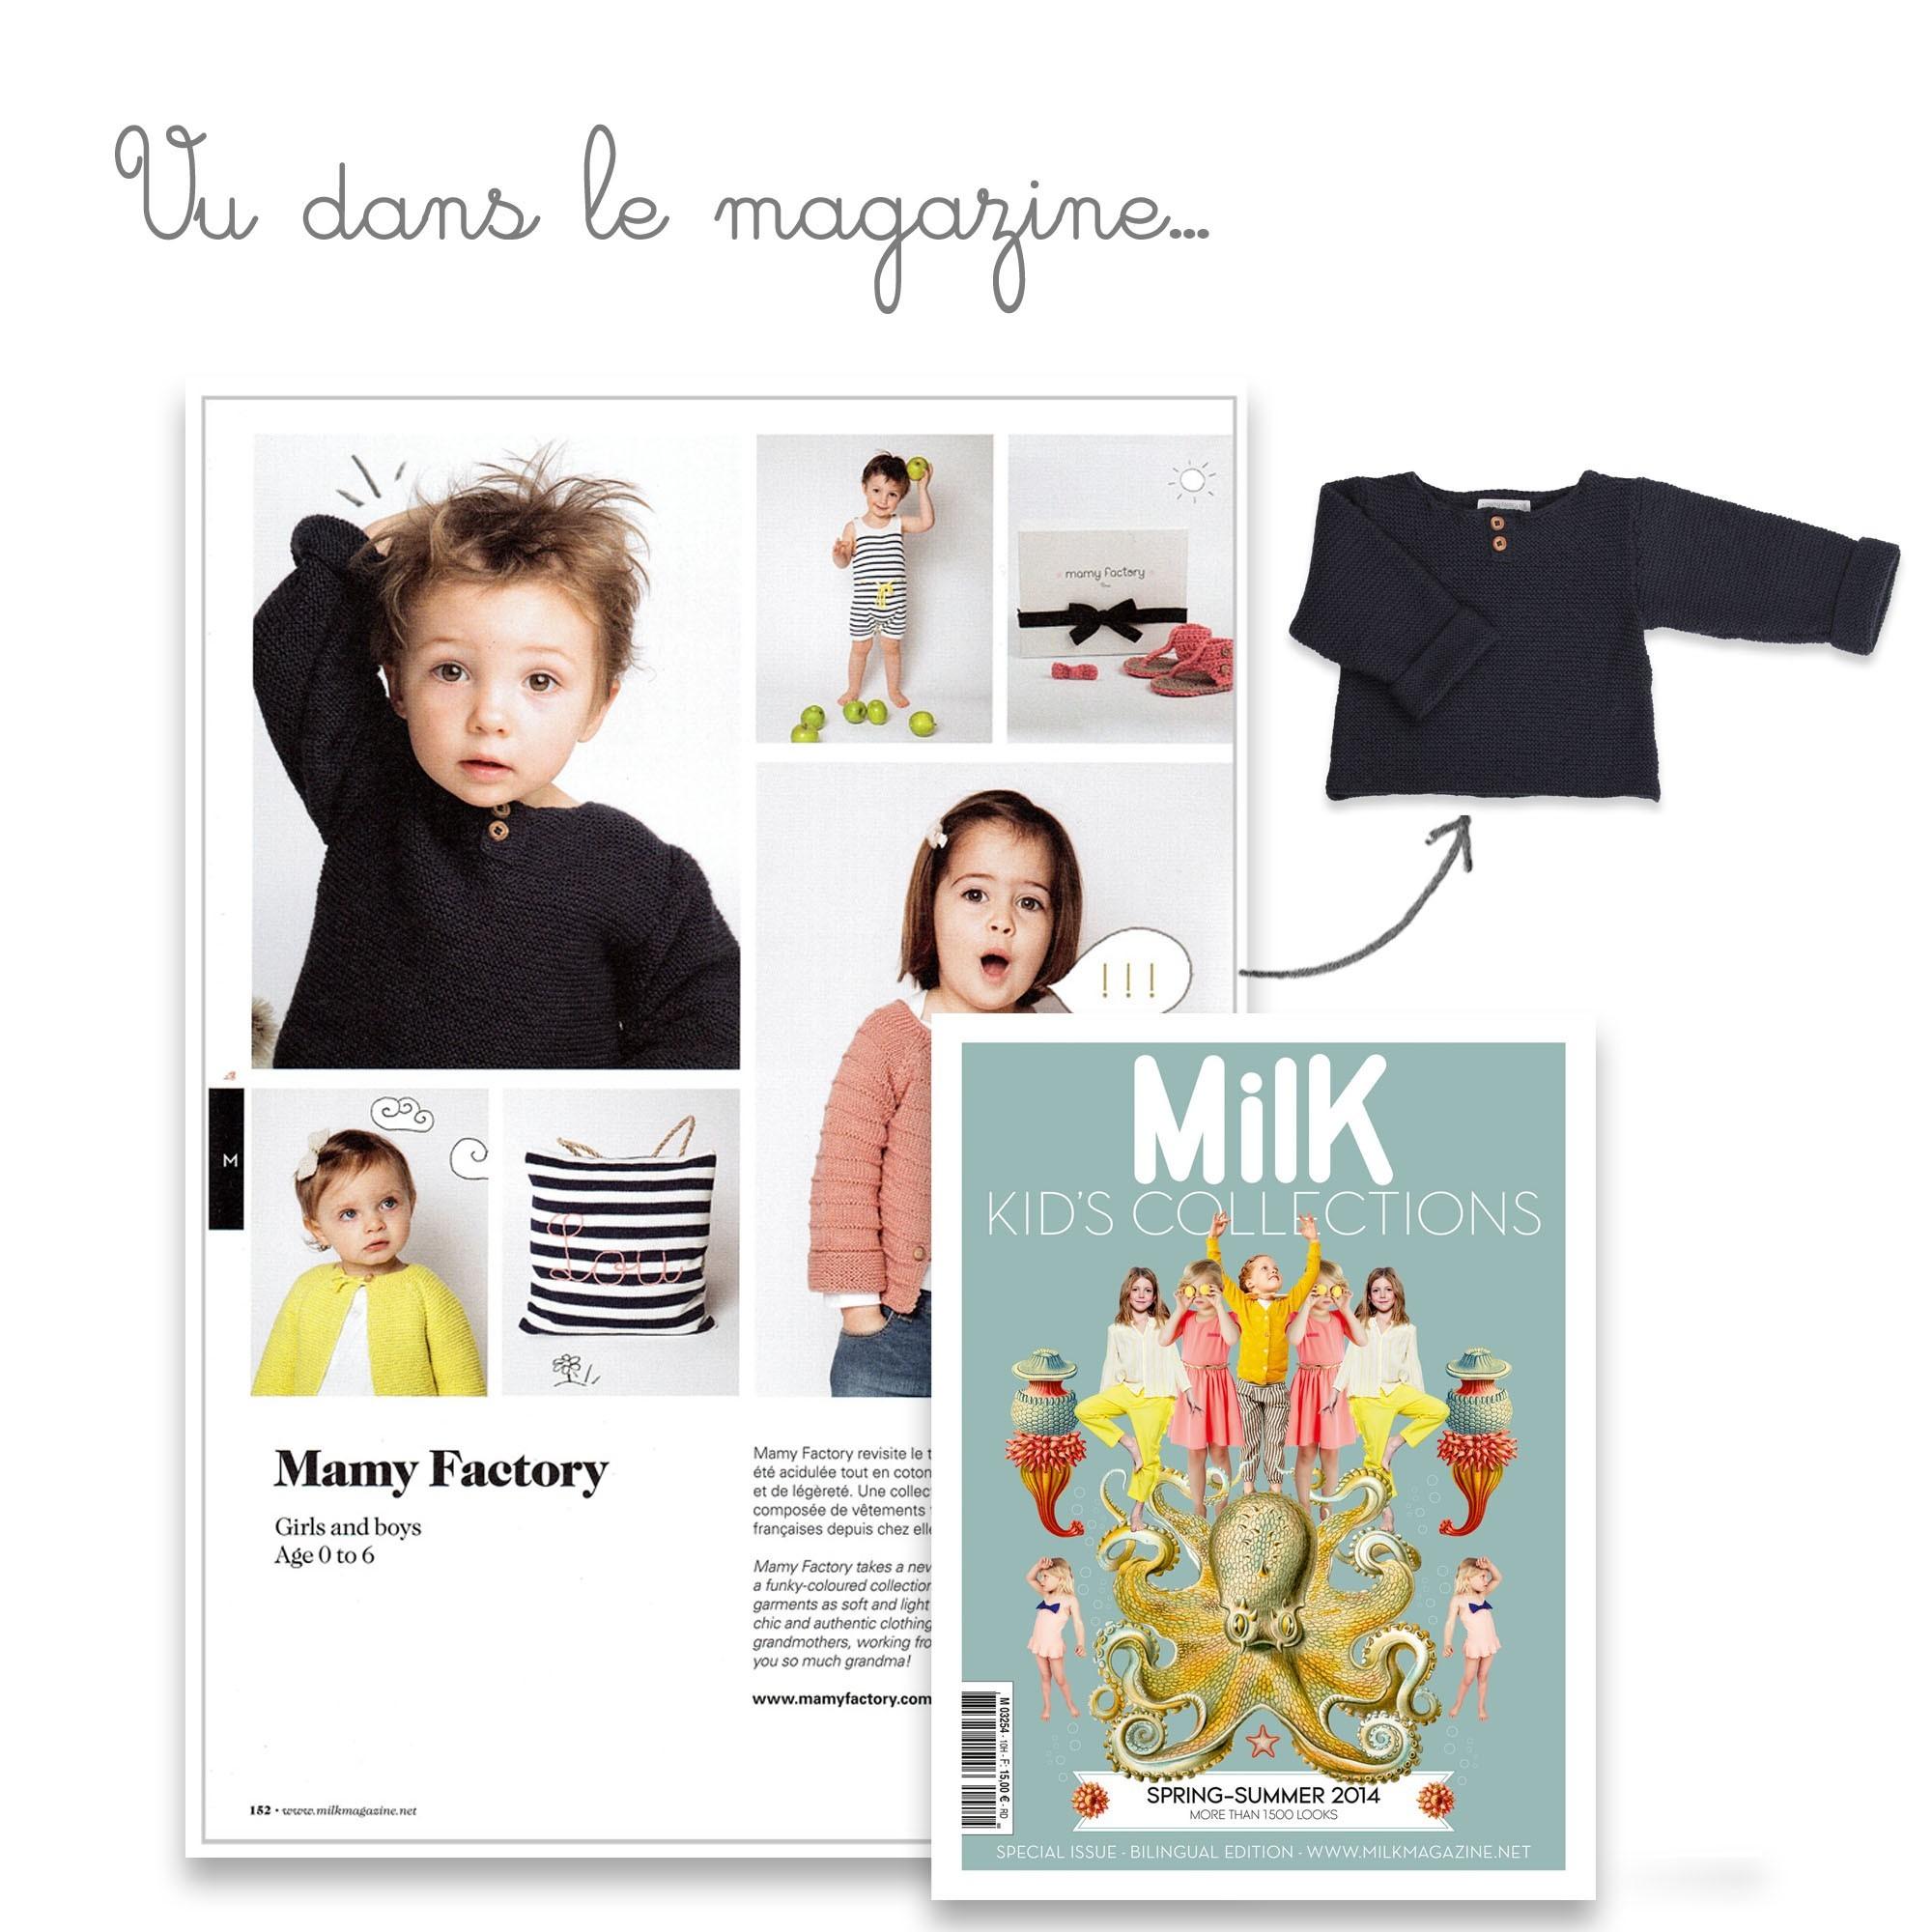 Pull Anatole vu dans le magazine Milk Kids Collection